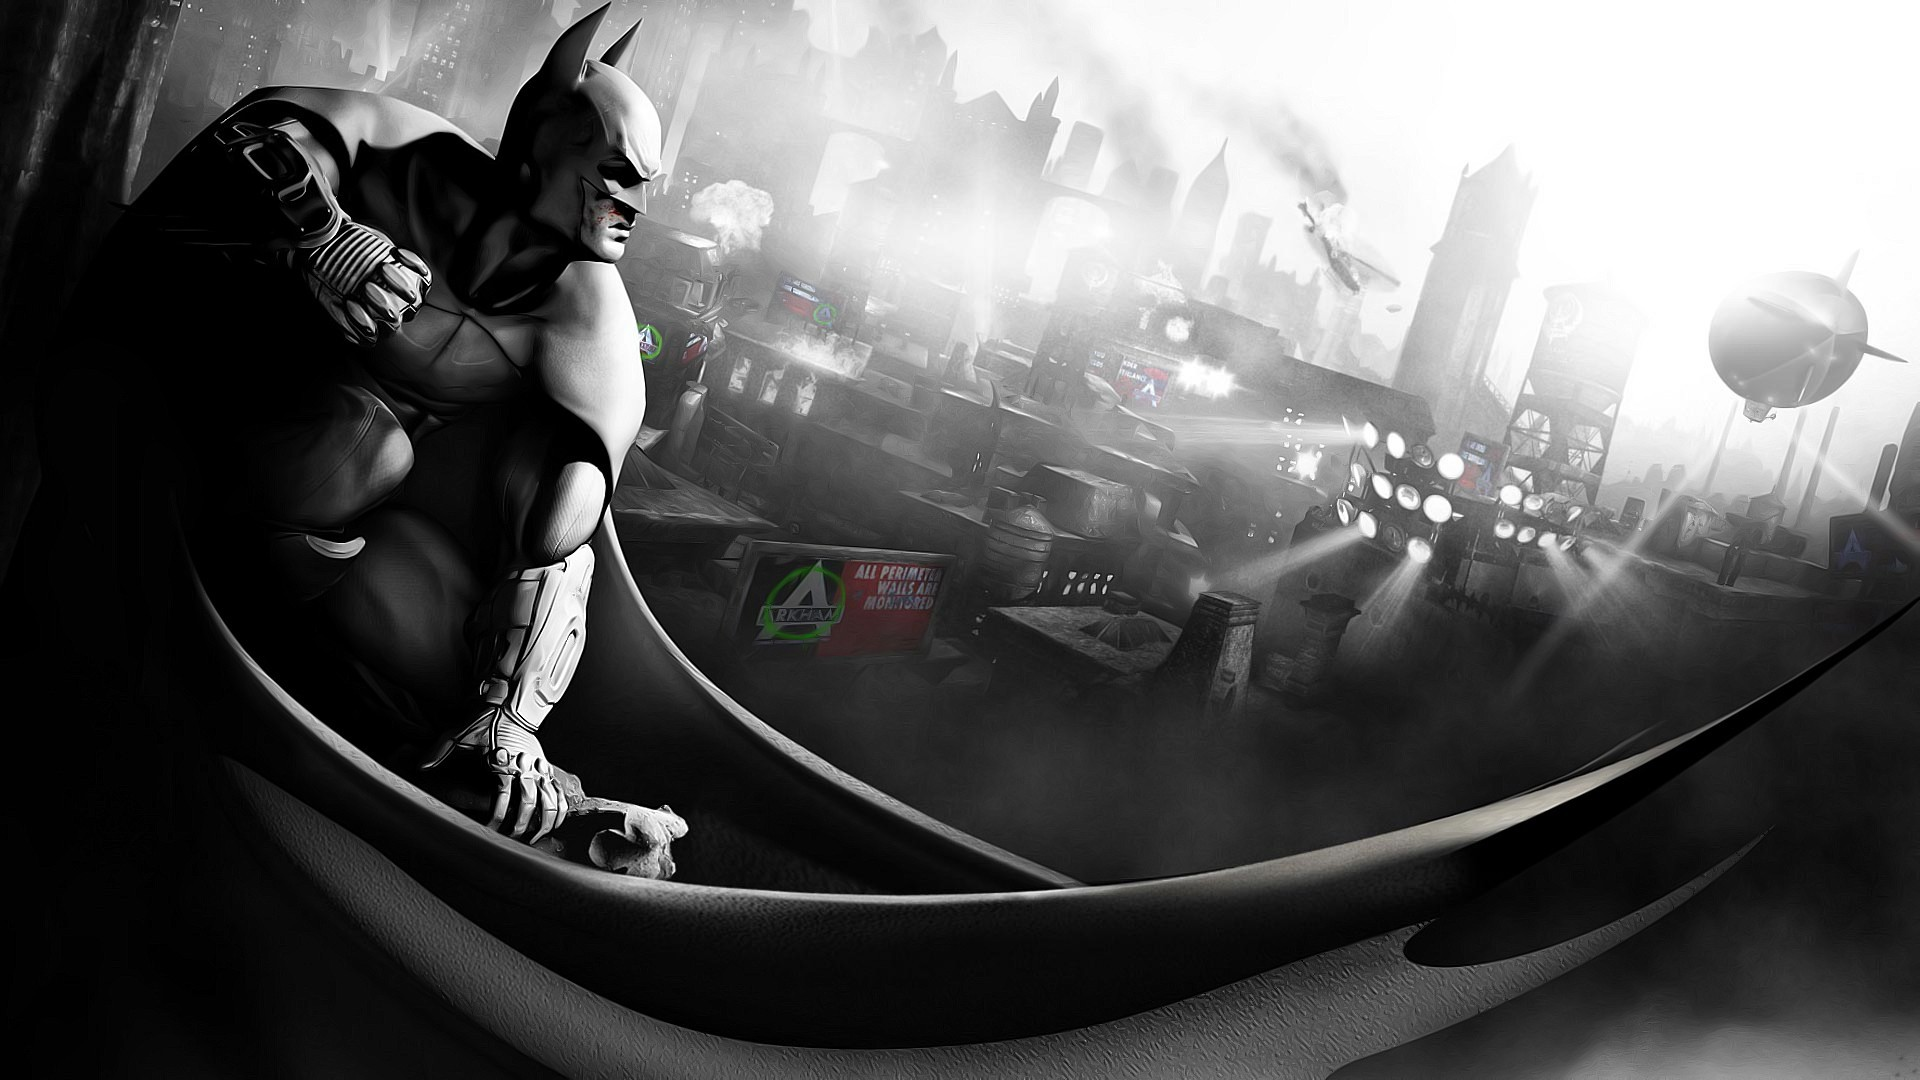 Batman Arkham City Hd Games 4k Wallpapers Images Backgrounds